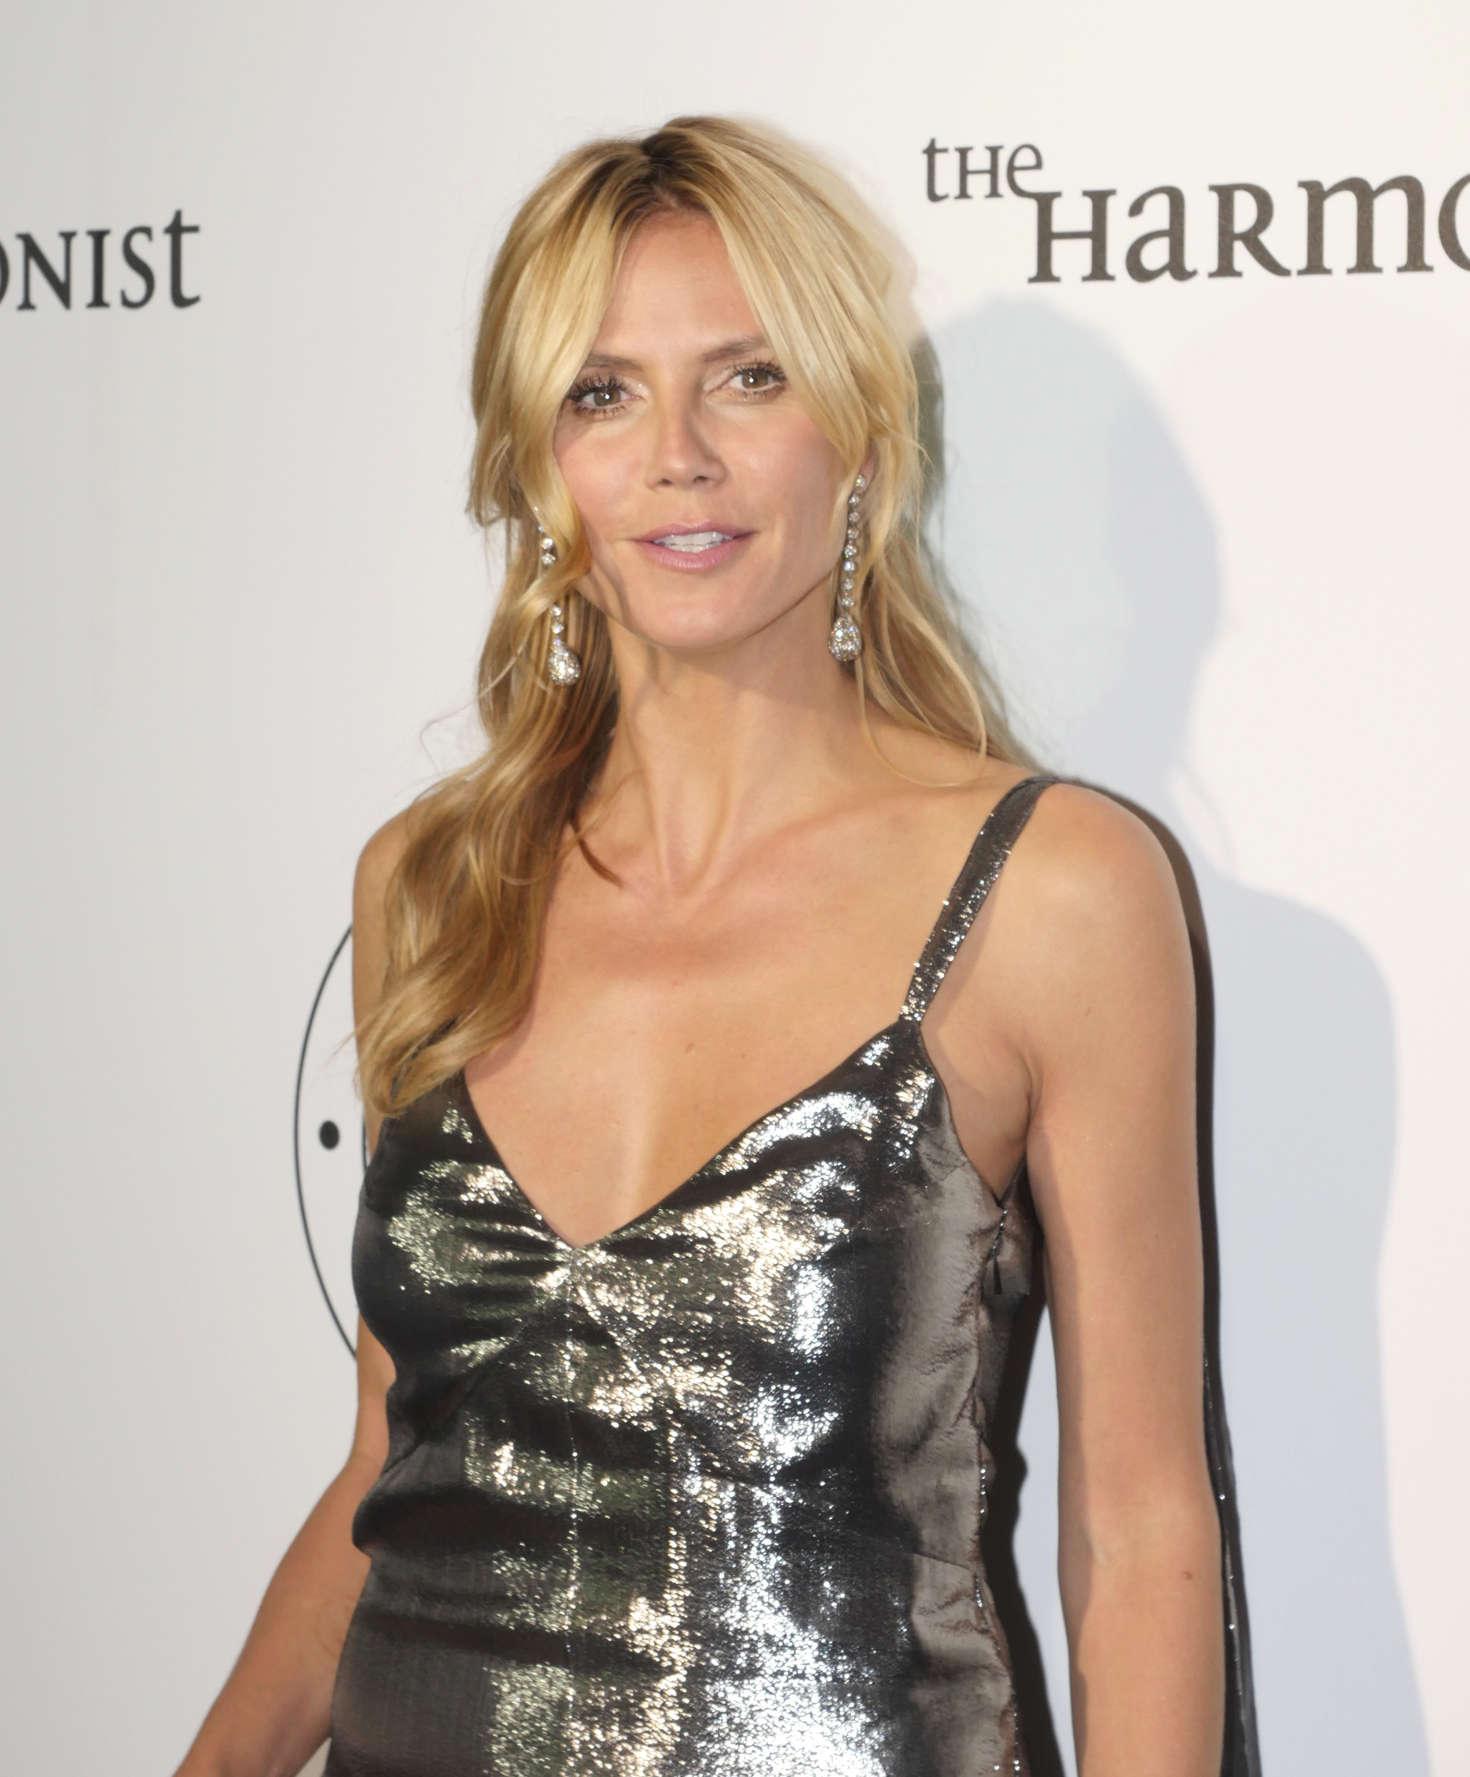 Heidi Klum - The Harmonist Cocktail Party at 2016 Cannes